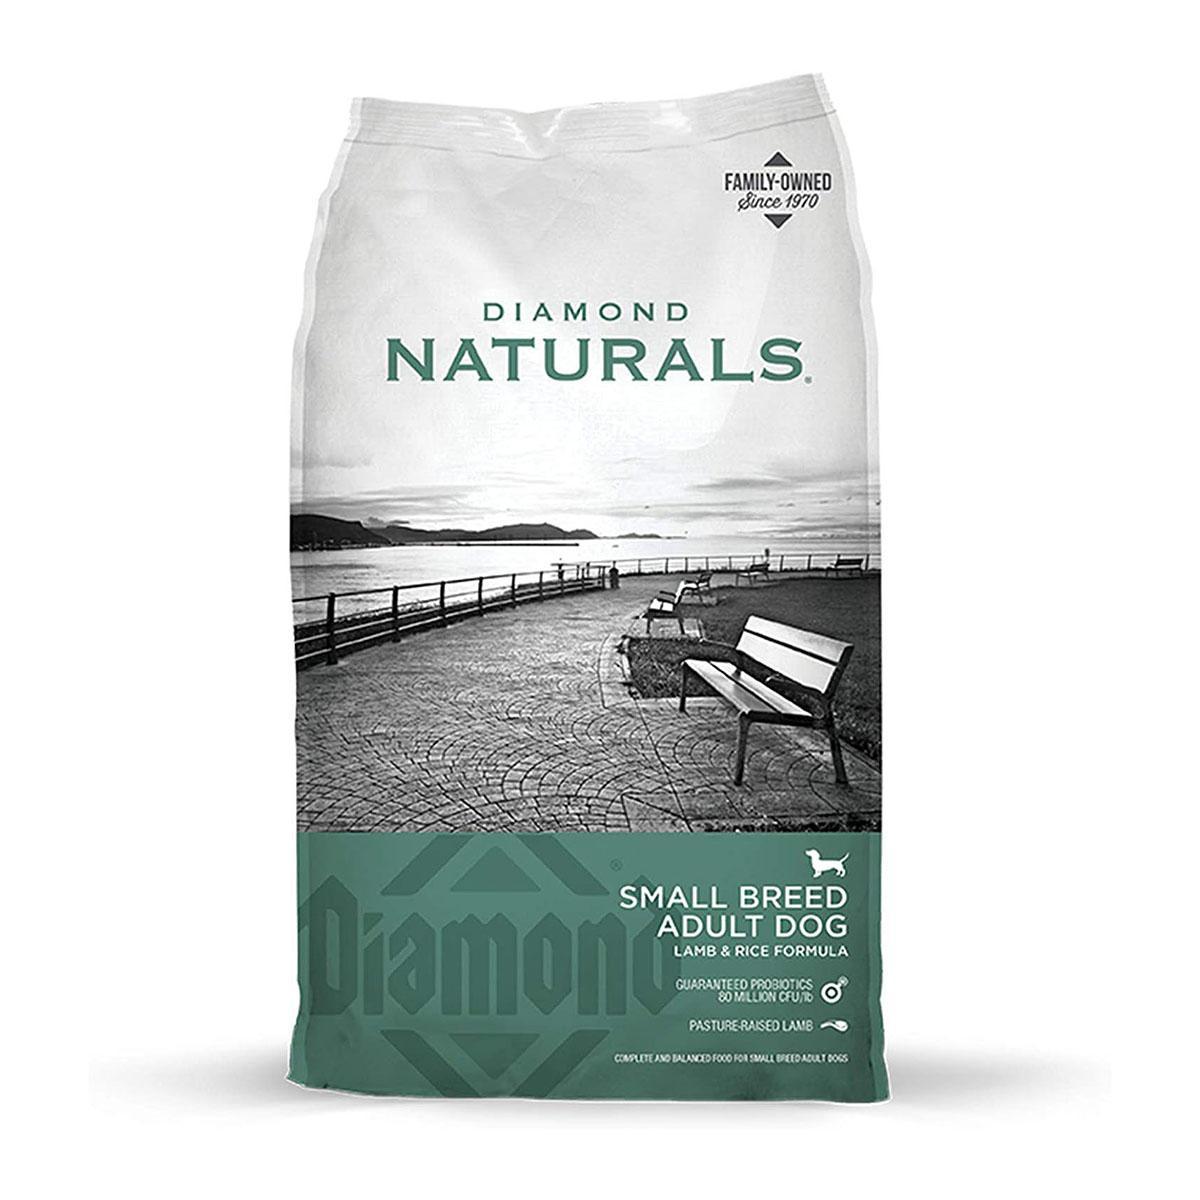 Diamond Naturals Small Breed Adult Dog Food - Lamb and Rice